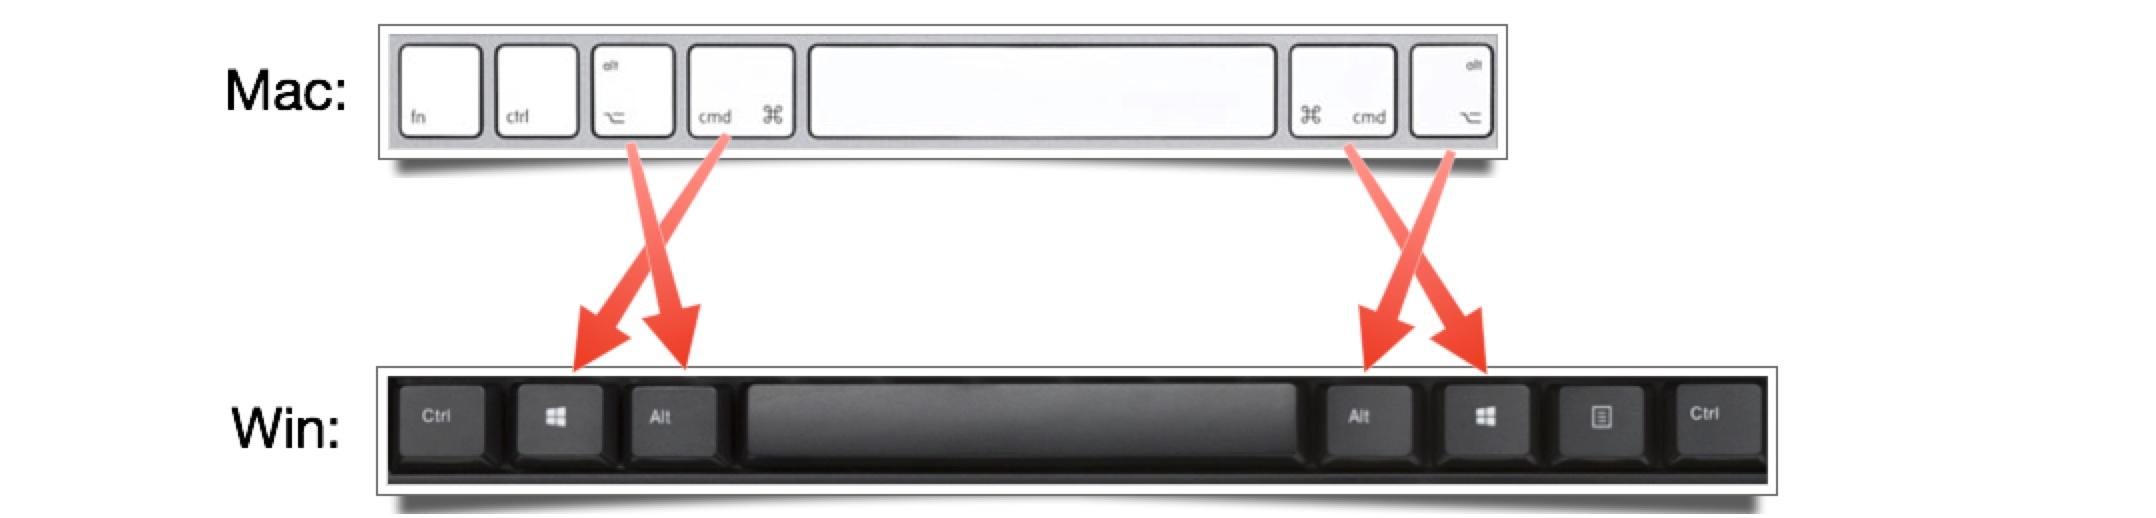 Apple Tastatur An Windows Pc